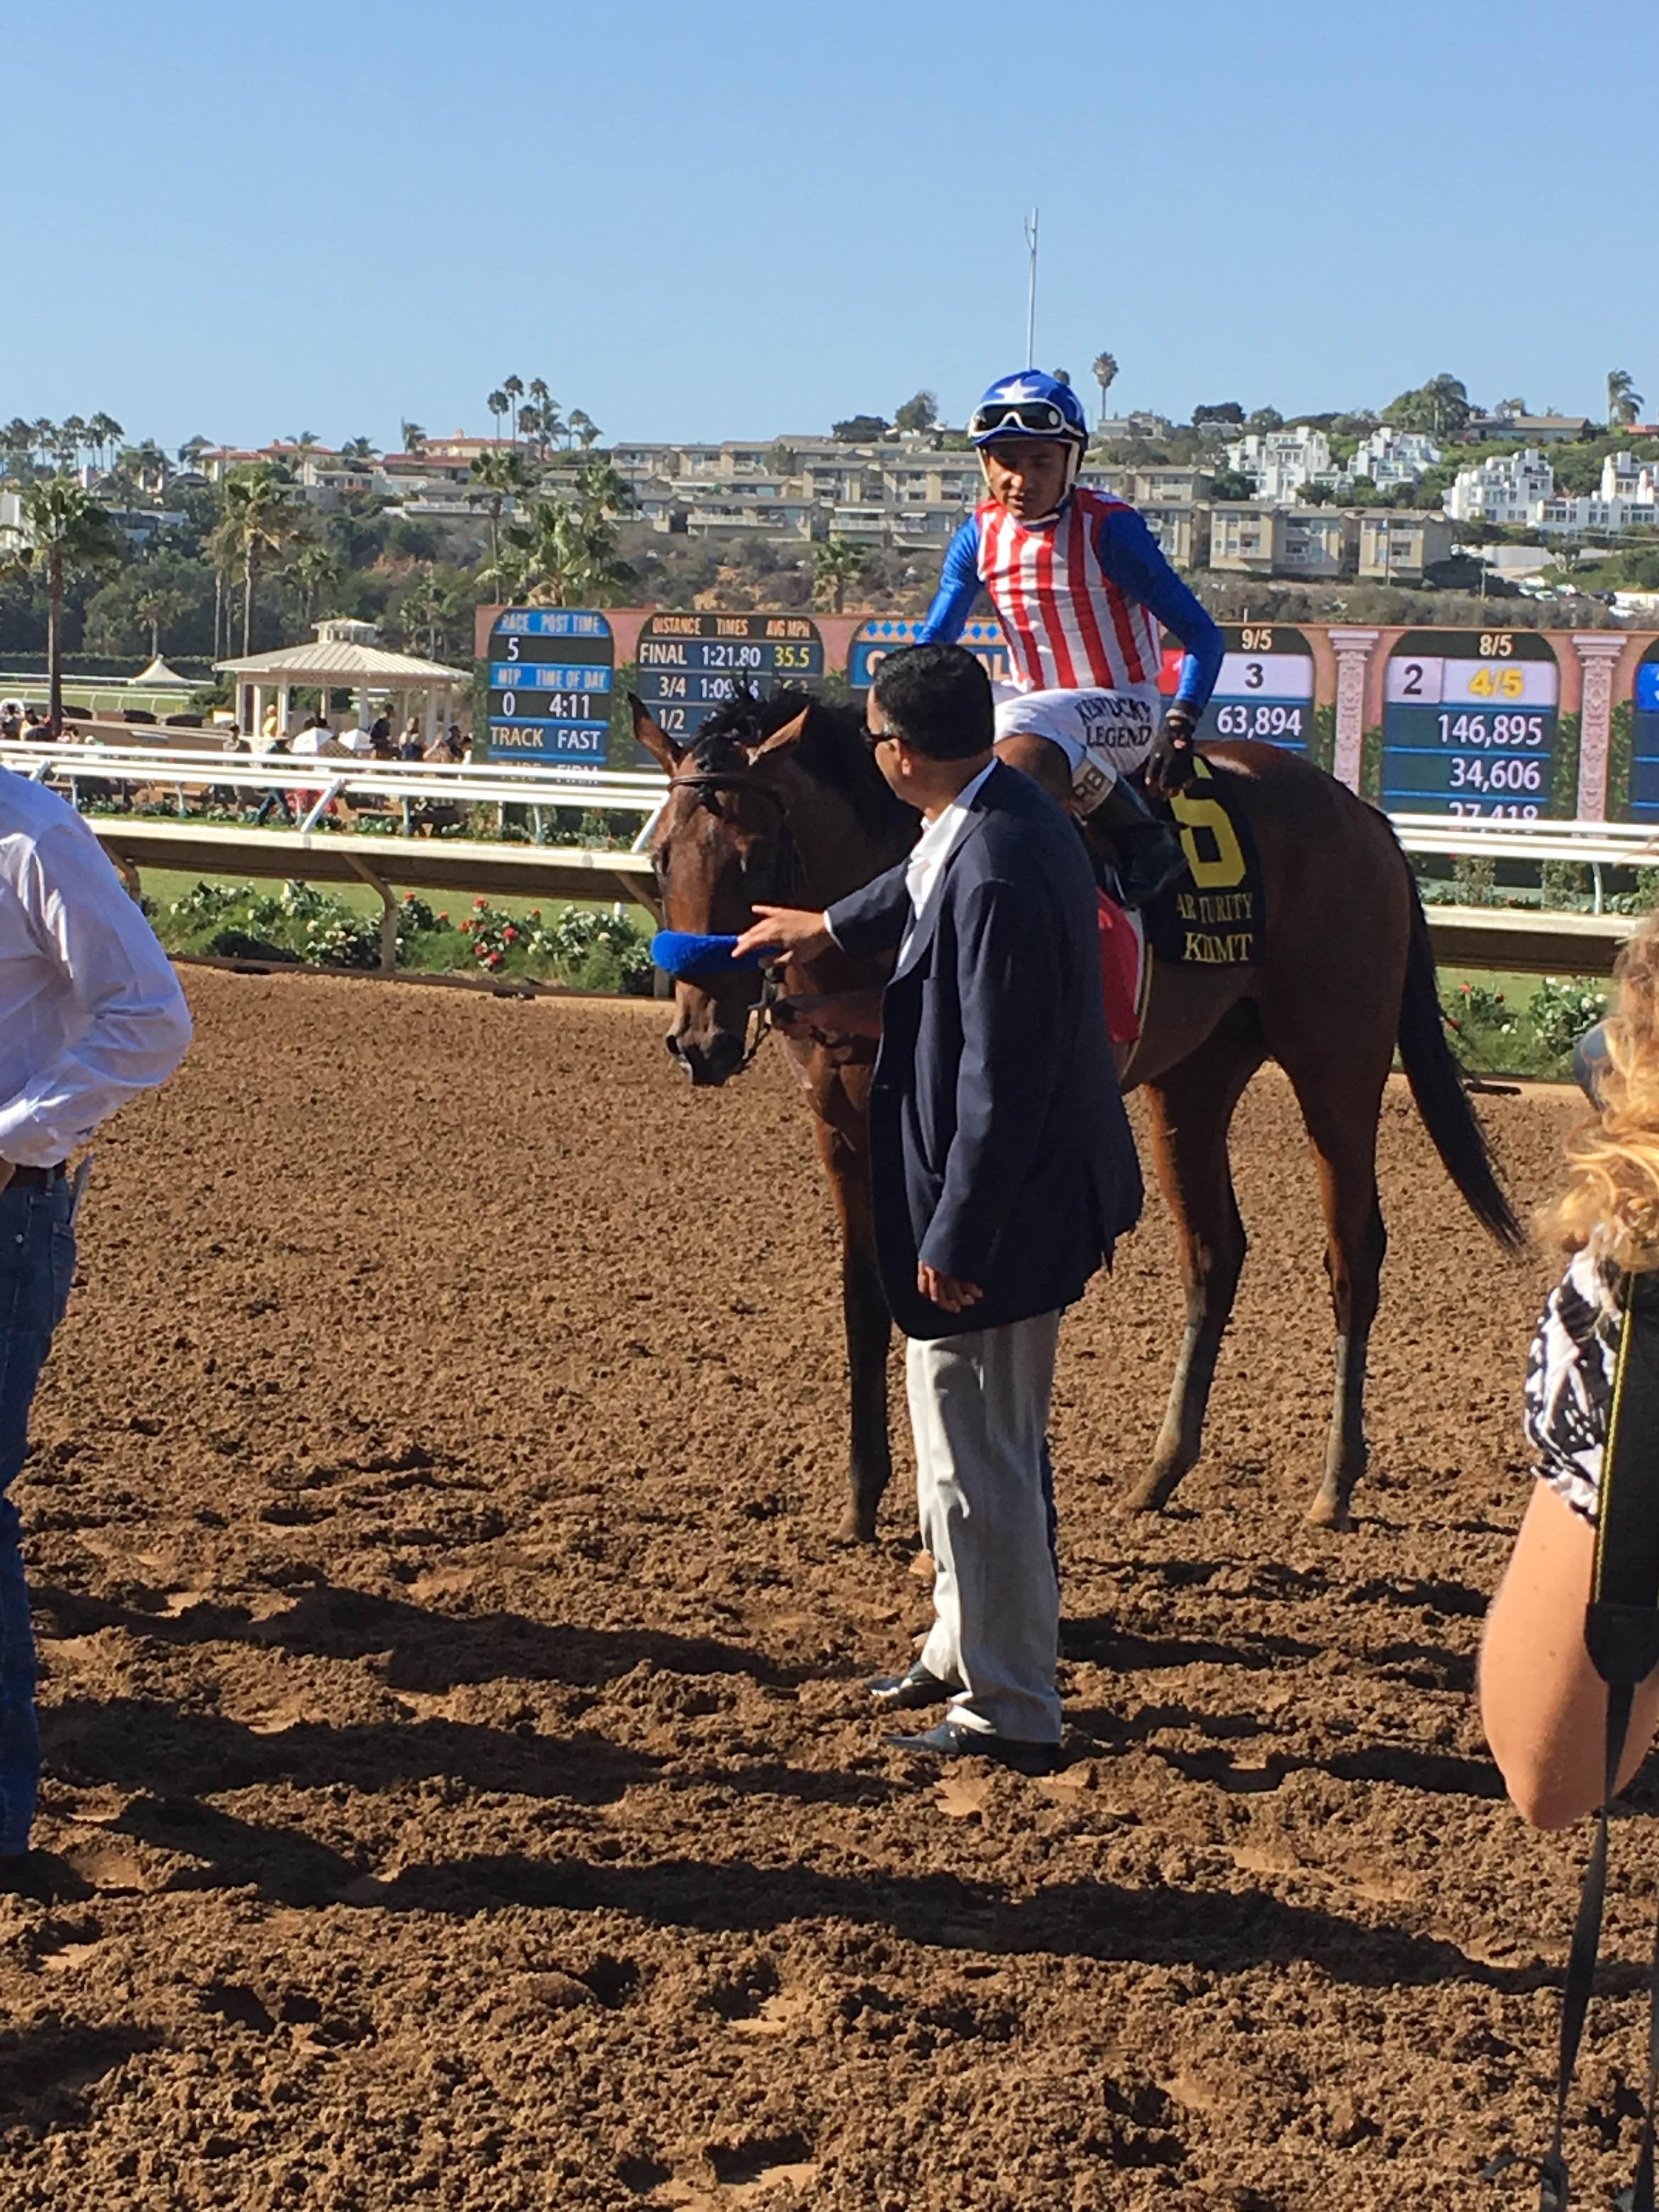 Klimt makes his way to the Del Mar winner's circle.